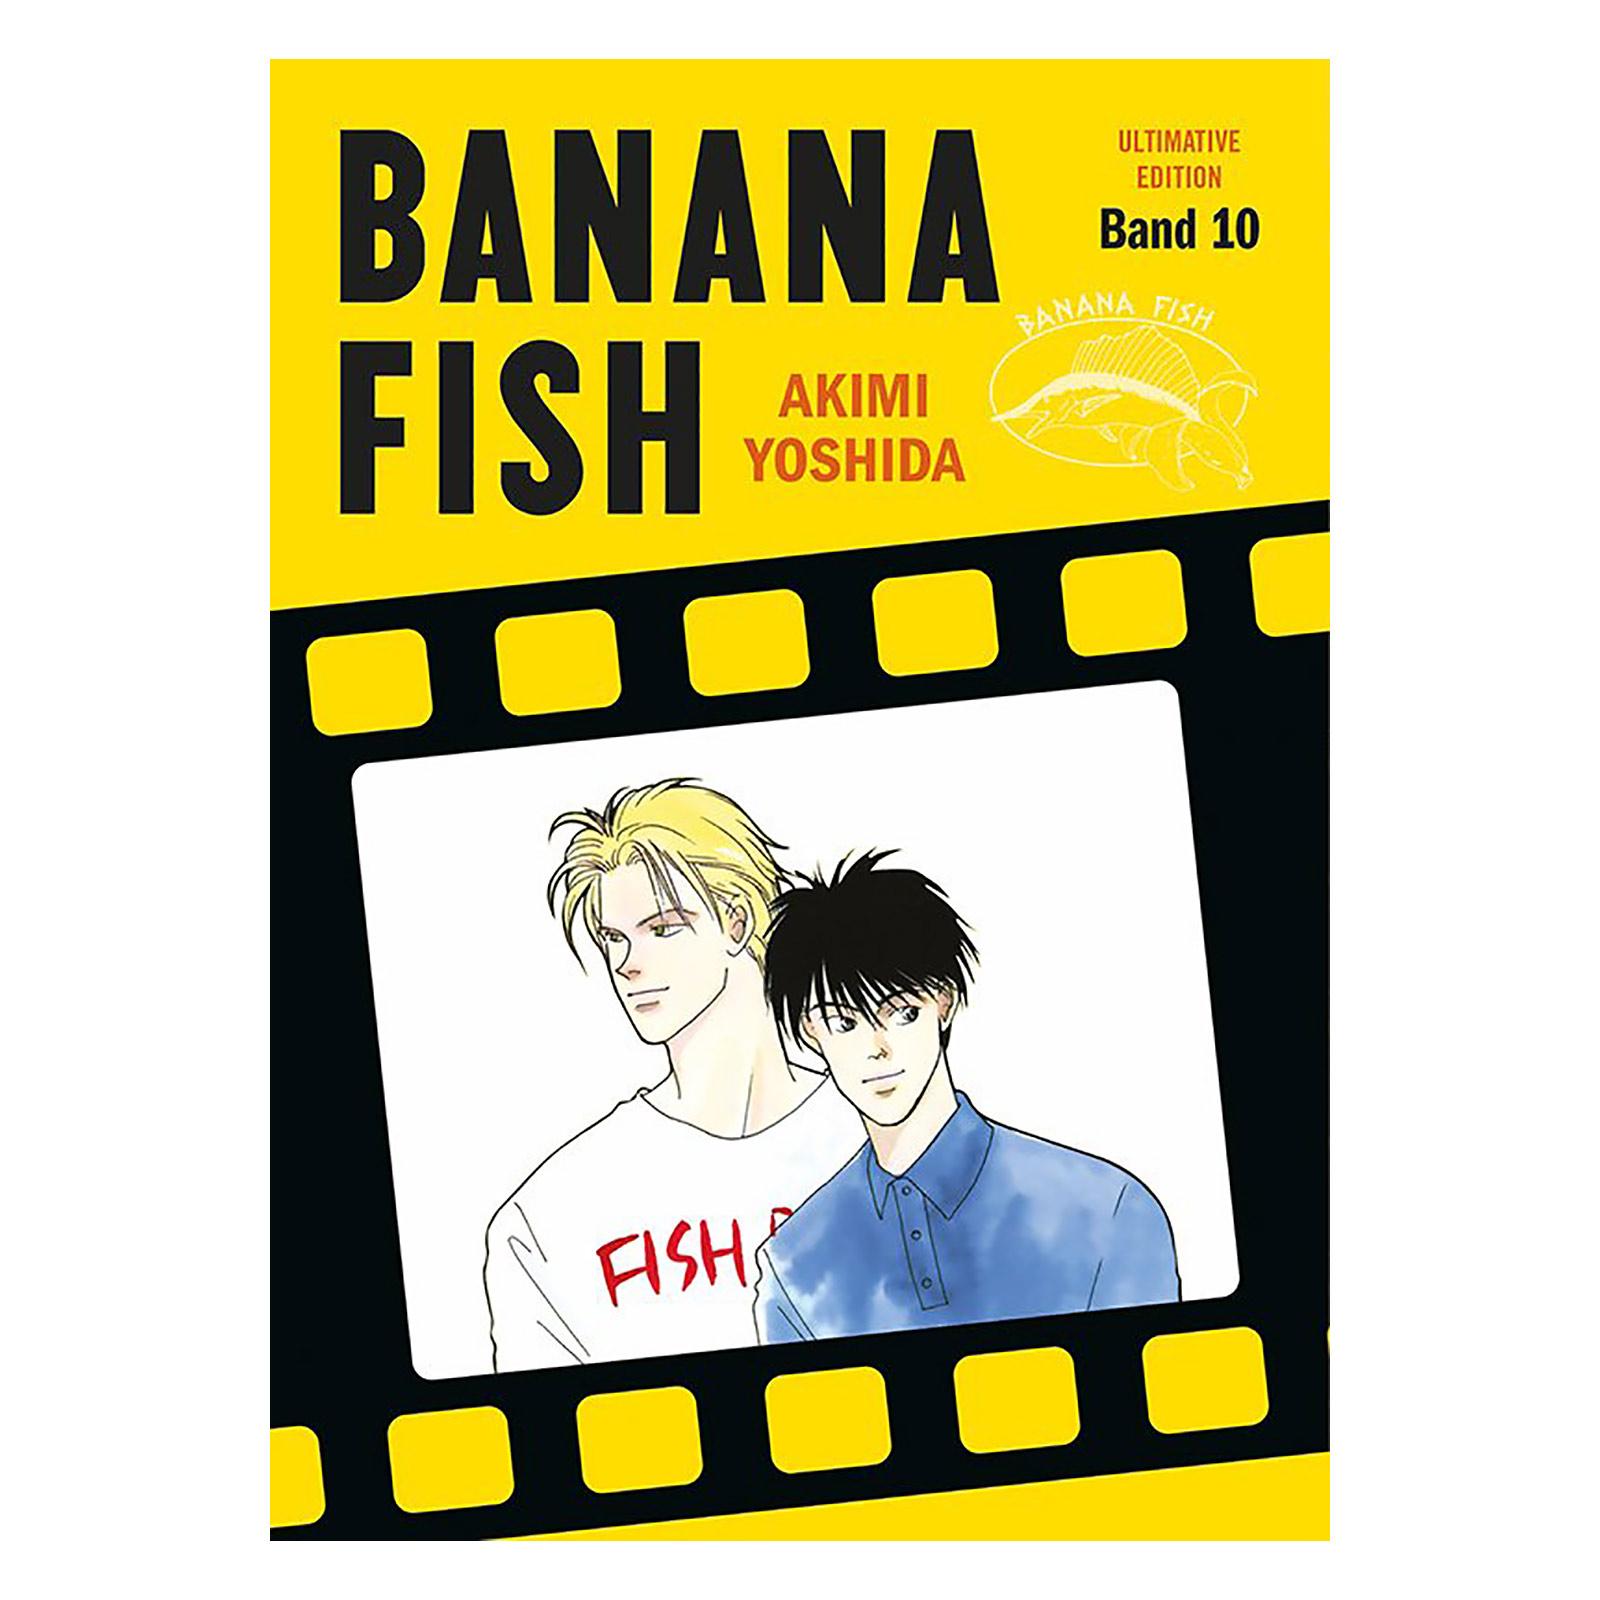 Banana Fish - Band 10 Taschenbuch Ultimate Edition